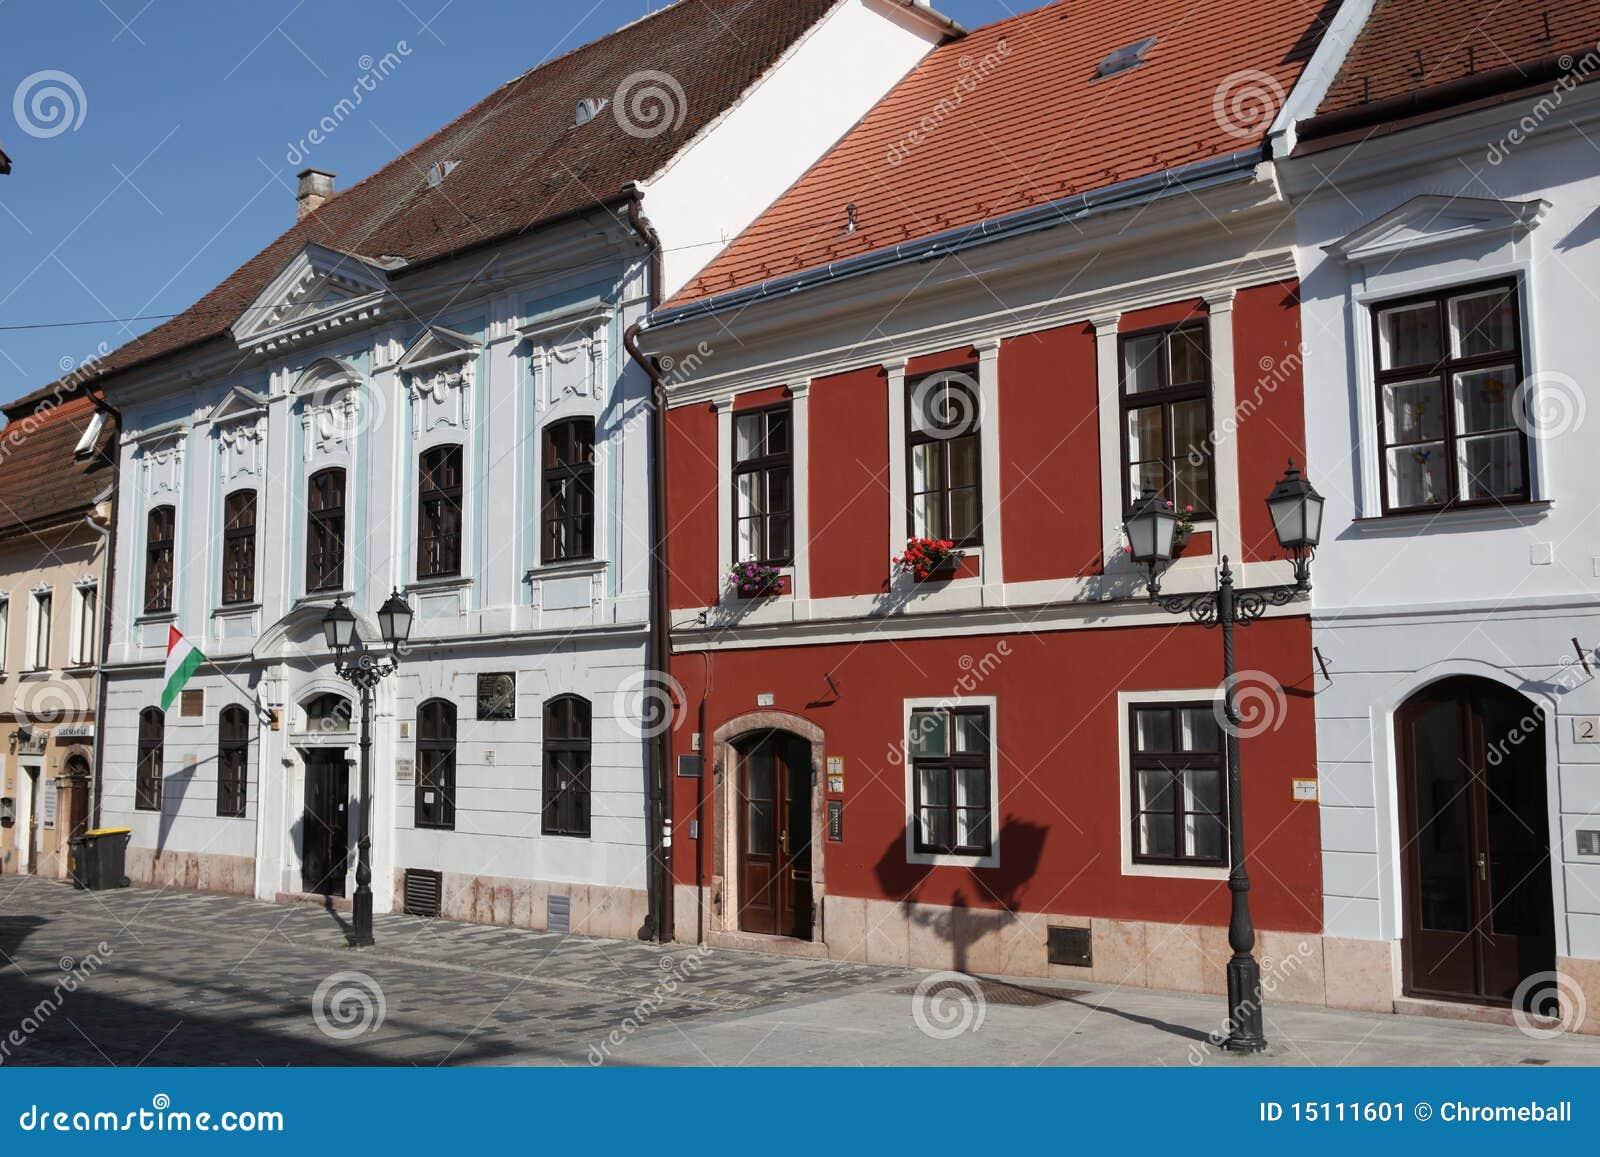 Hungary gy r street sex